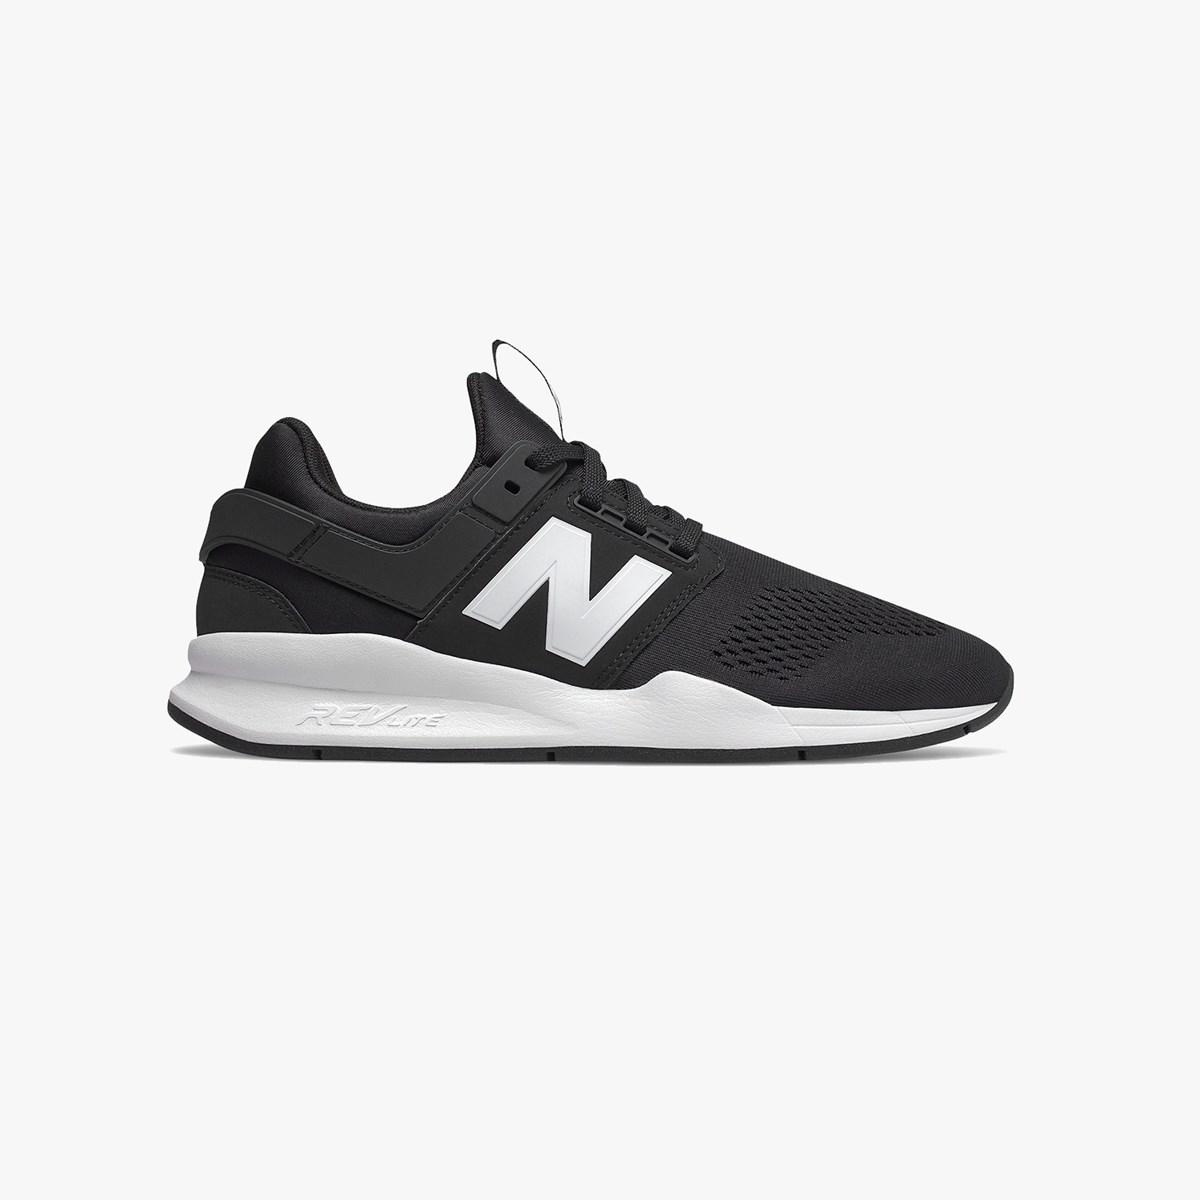 New Balance 247 - Ms247eb - SNS | sneakers & streetwear online since 1999